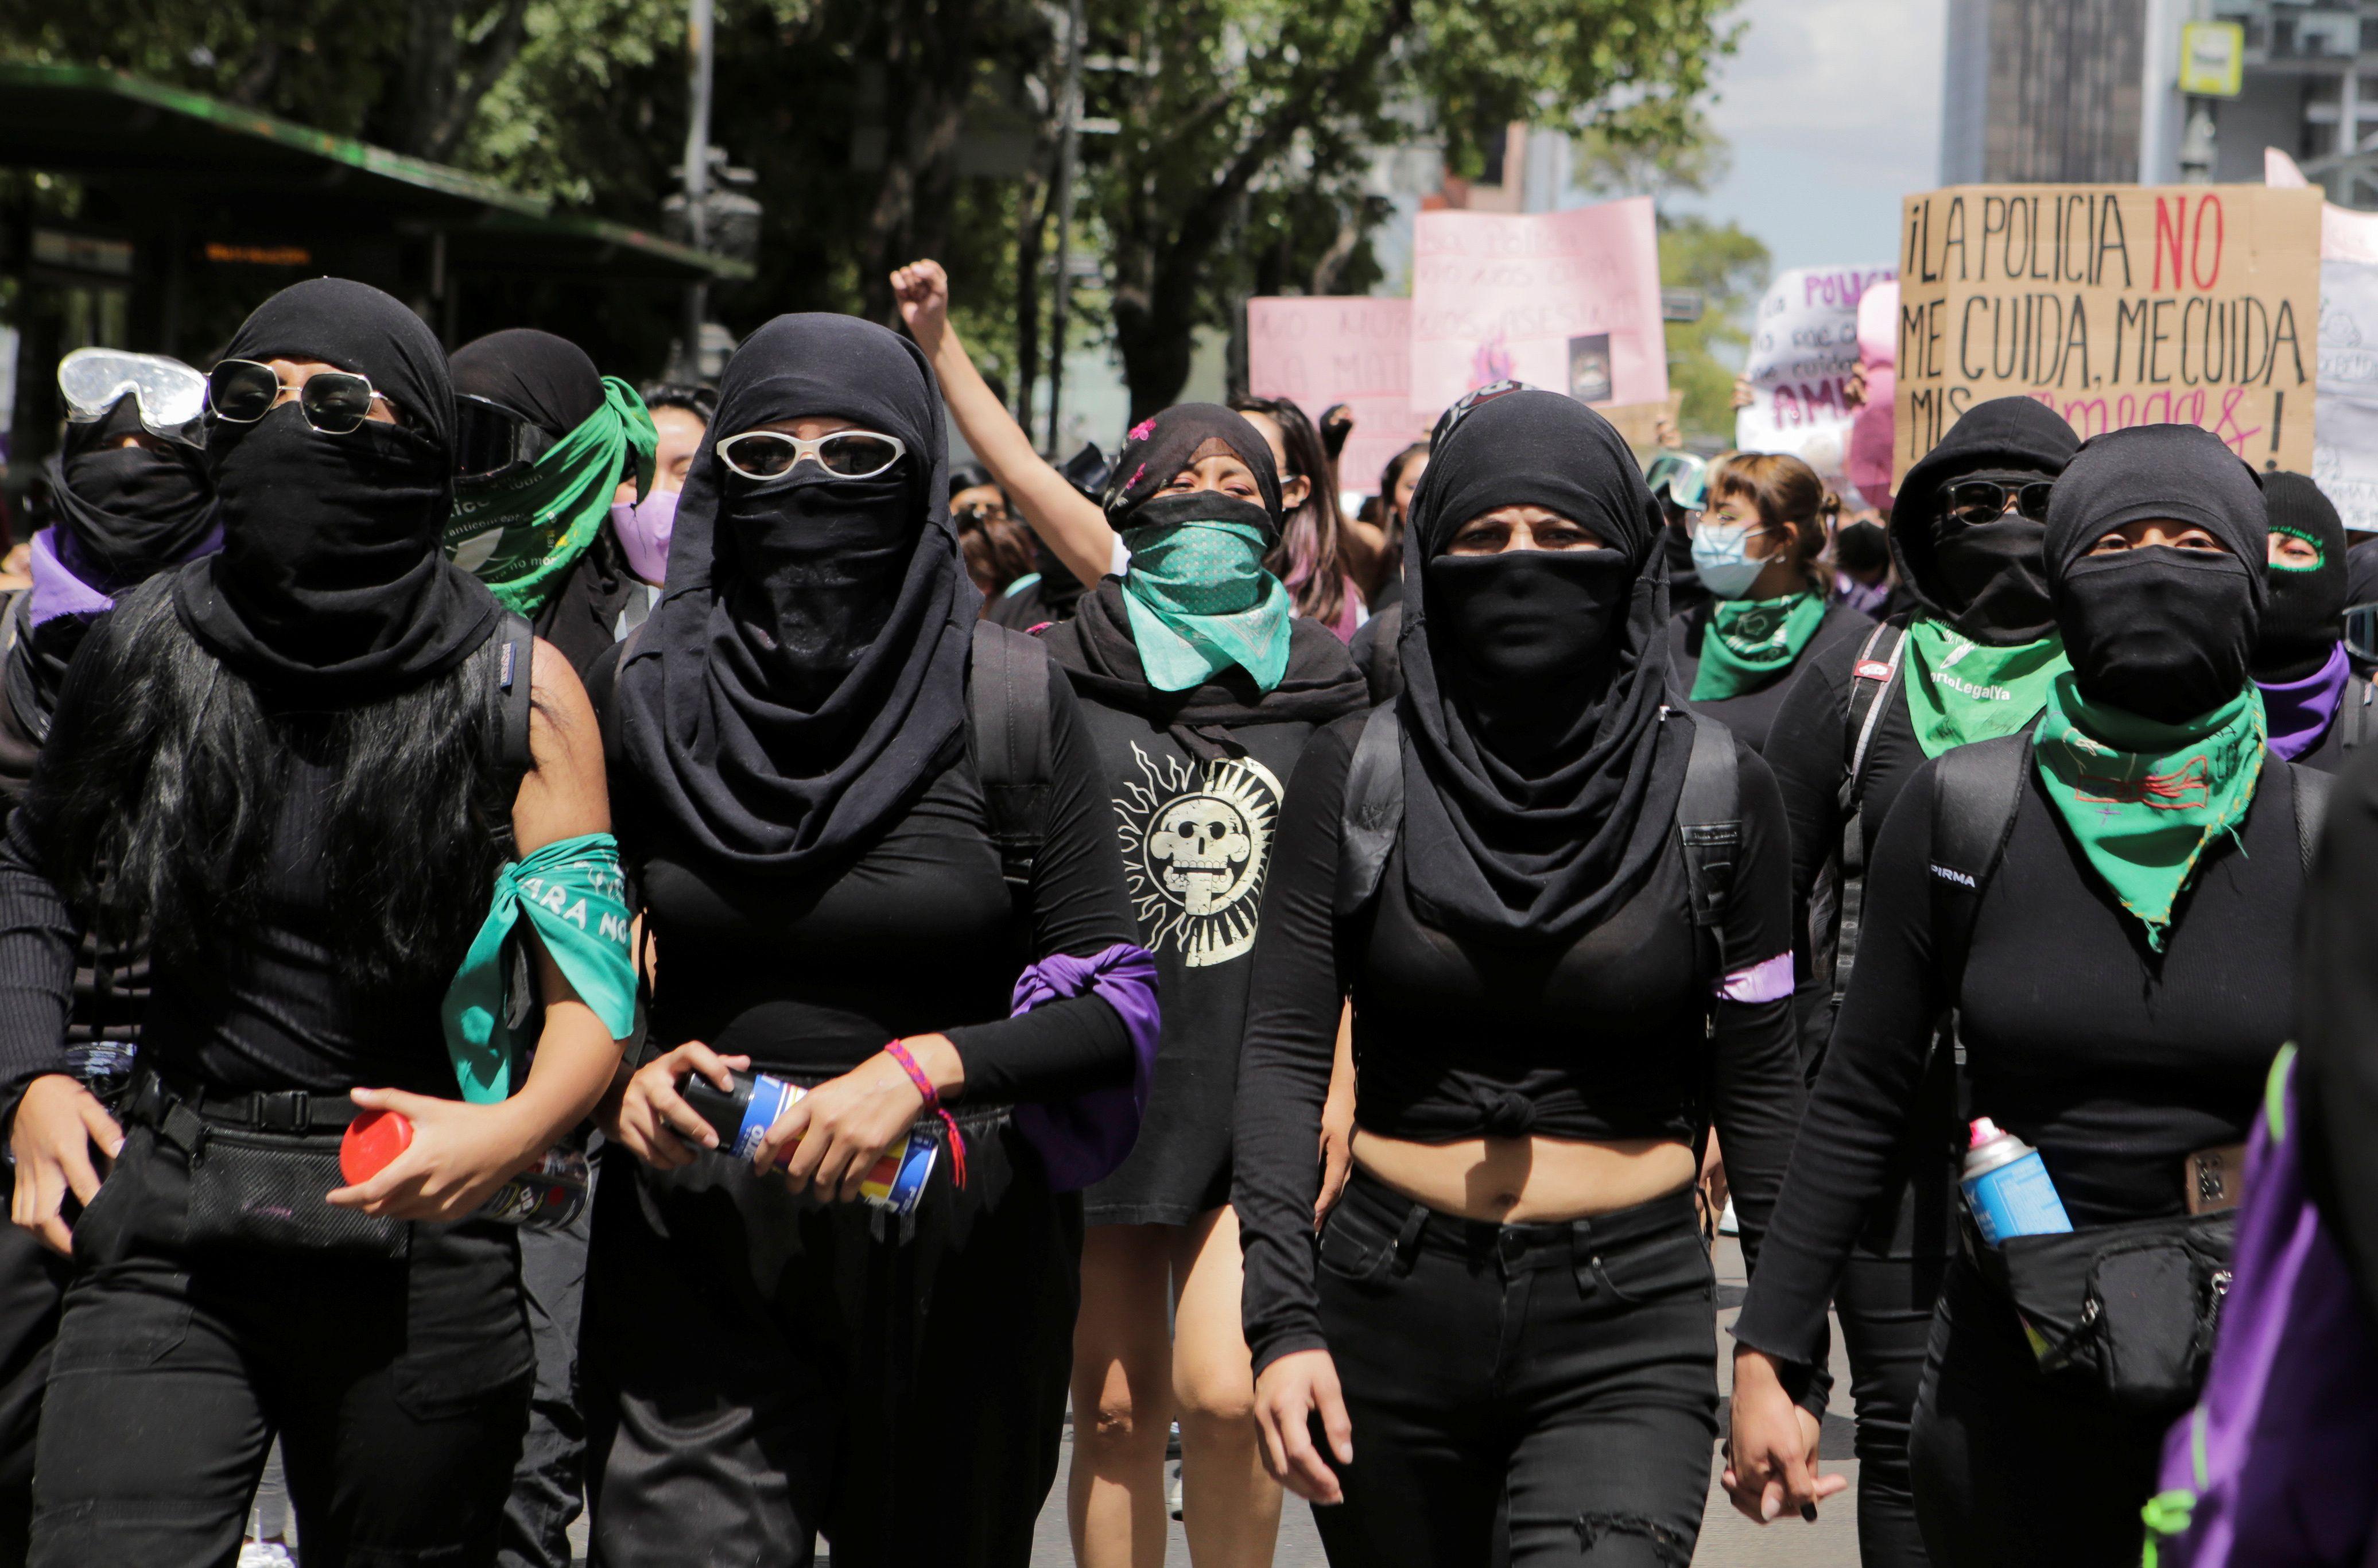 Varios grupos feministas marcharon desde el Monumento a la Revolución al Zócalo Capitalino (REUTERS/Raquel Cunha)